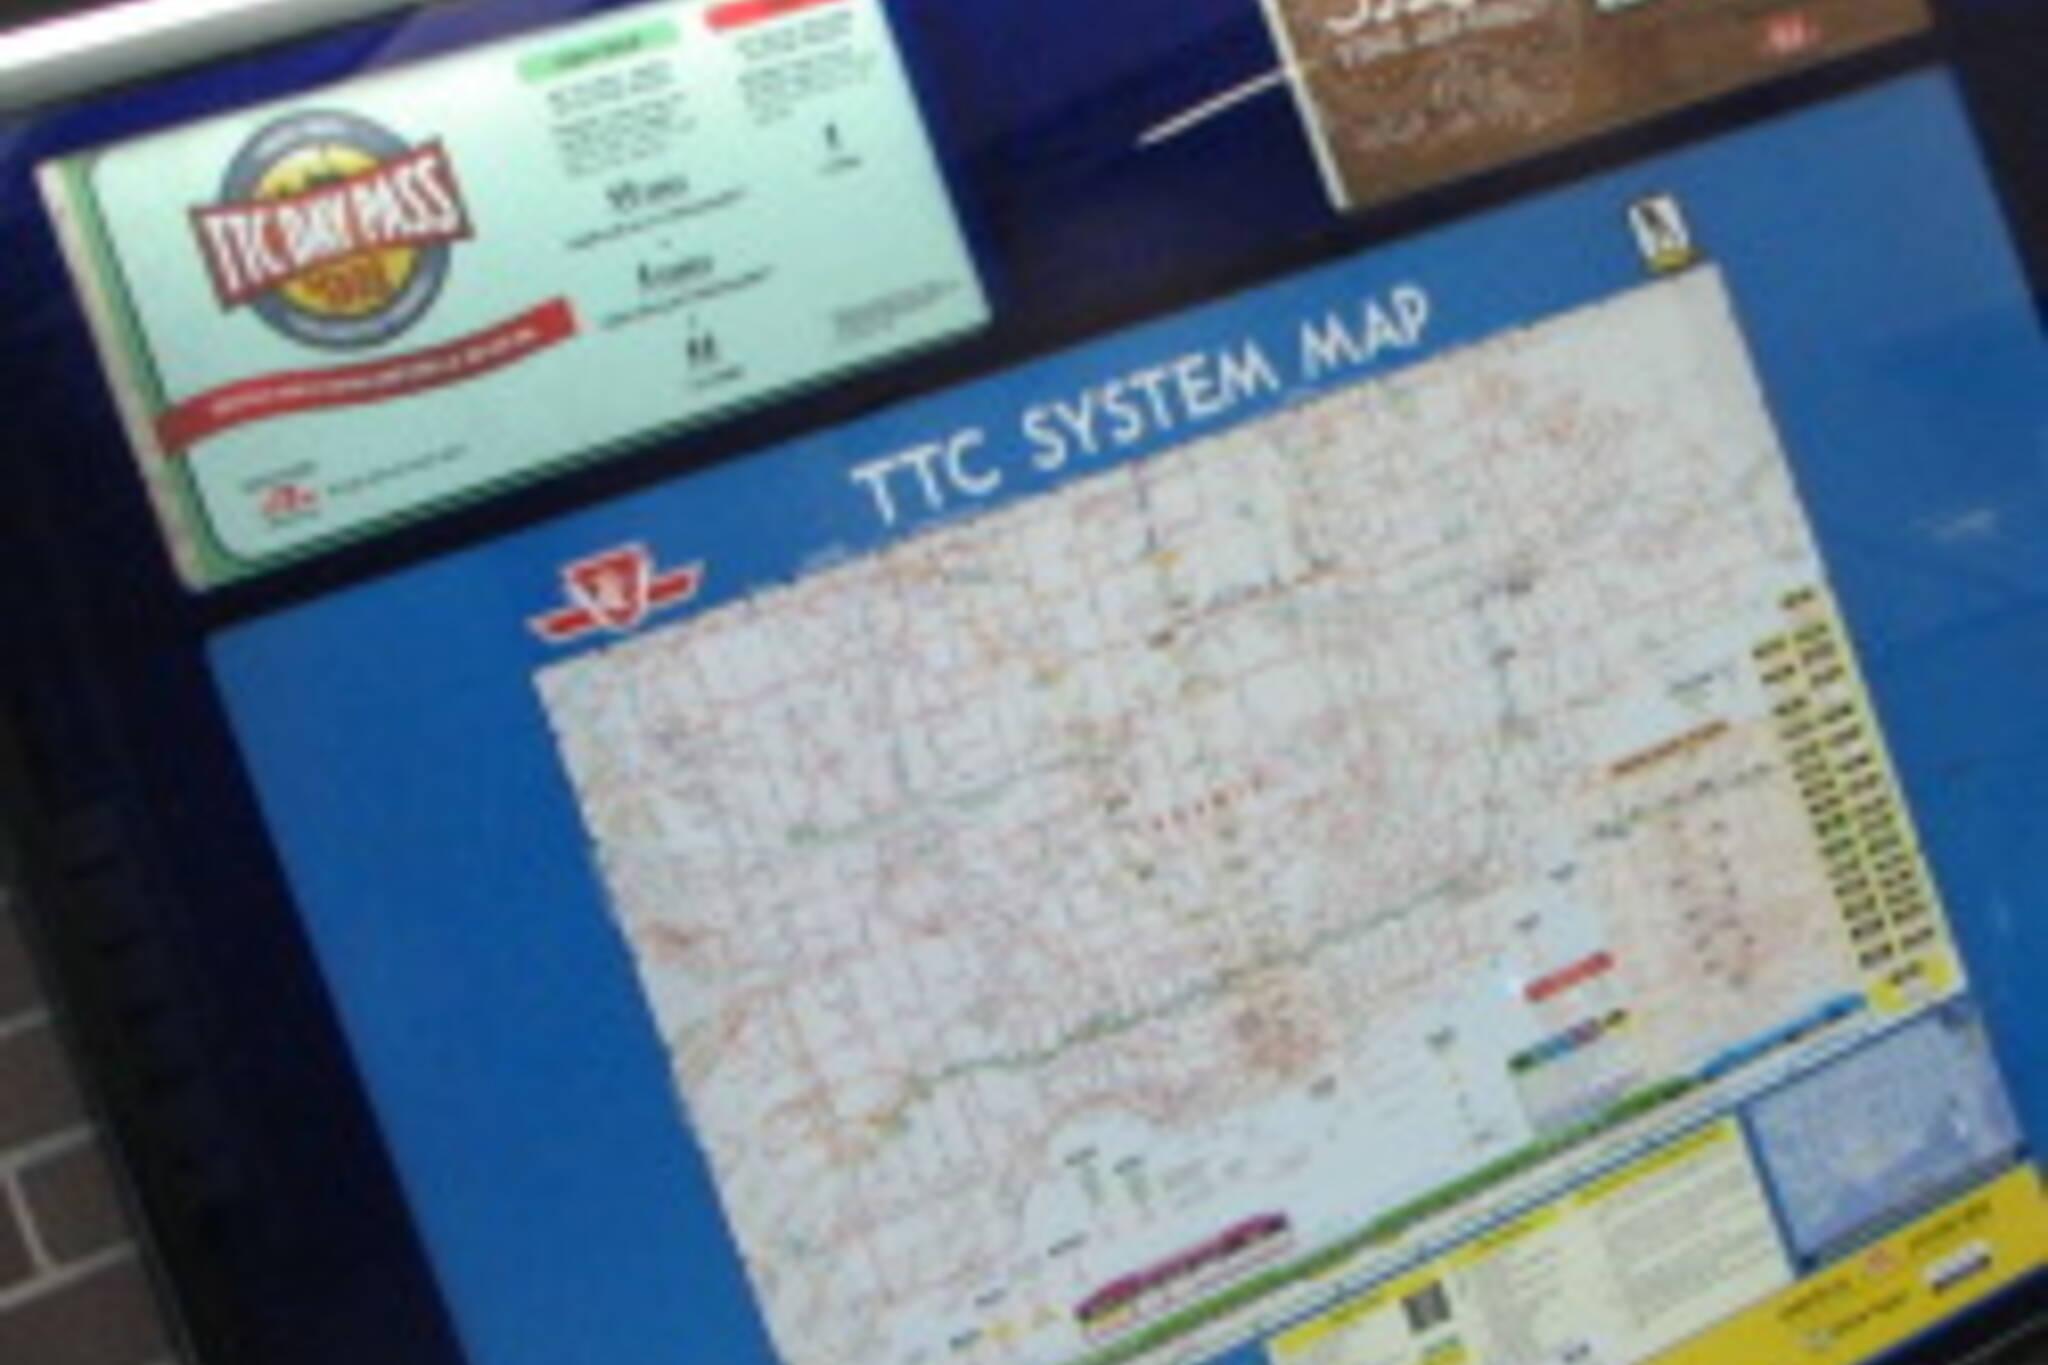 TTC Route Planner